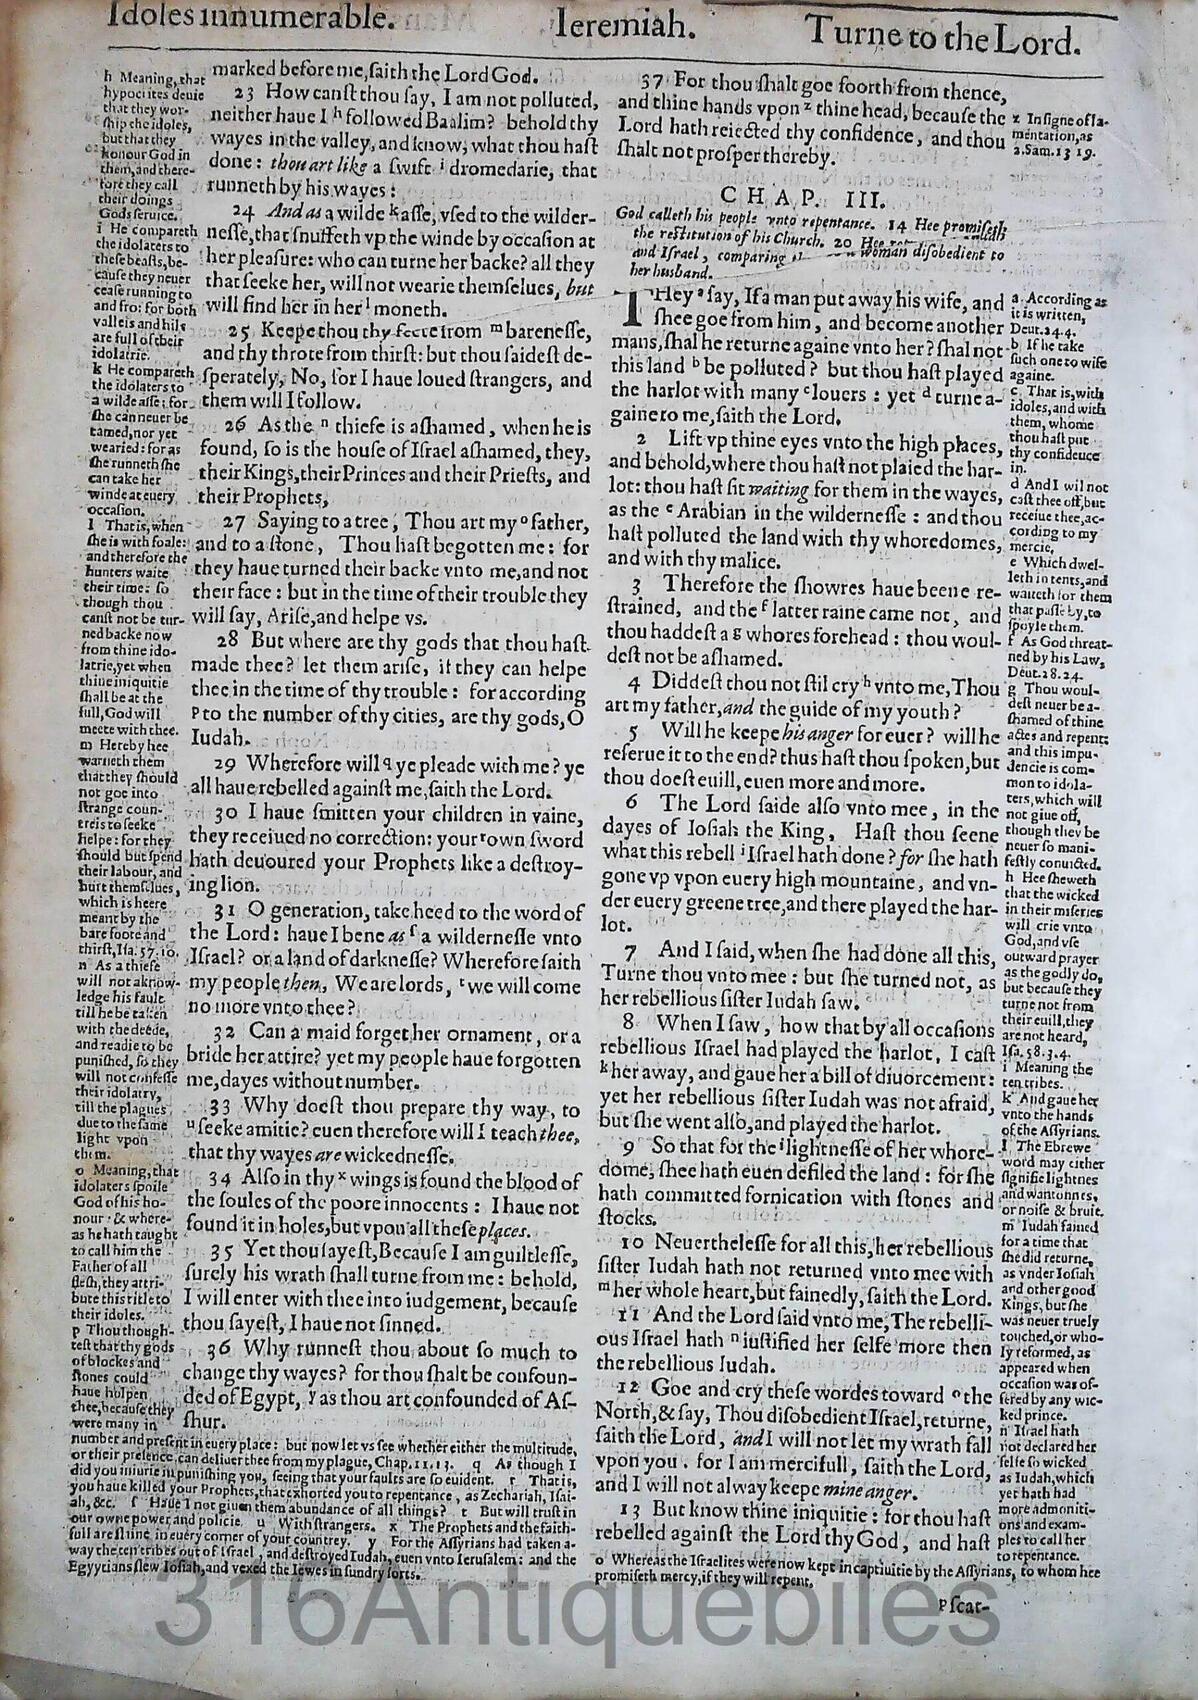 1612 GENEVA BIBLE JEREMIAH LEAVES